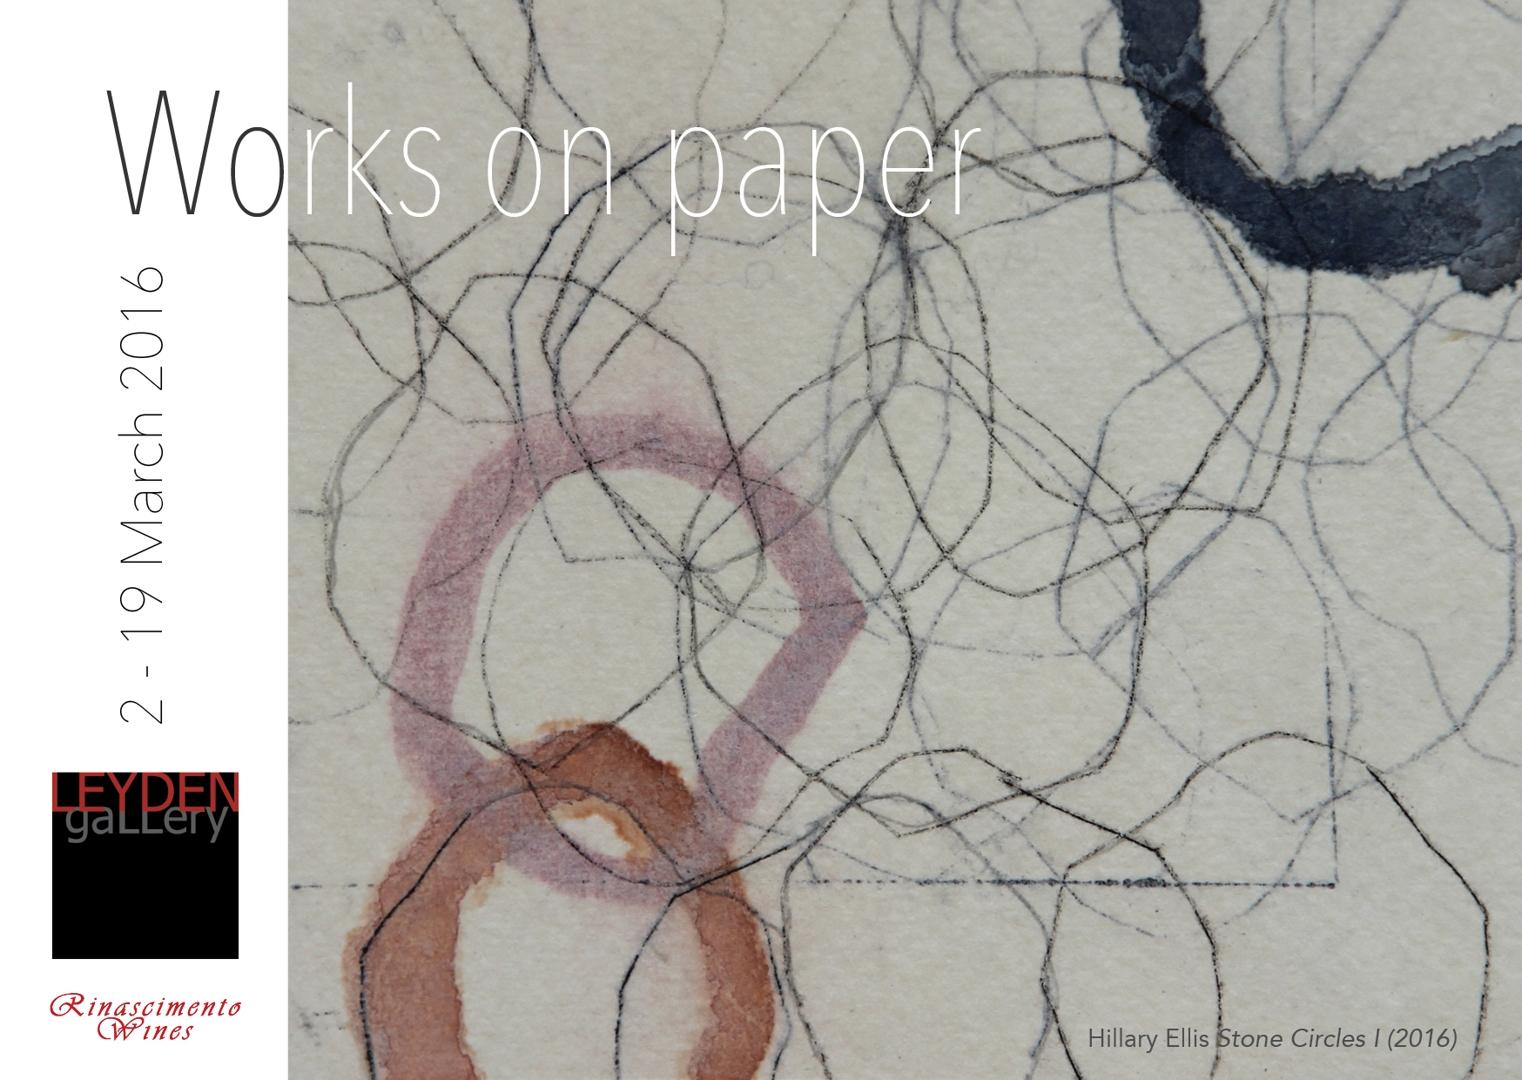 Works on paper, Leyden Gallery. image